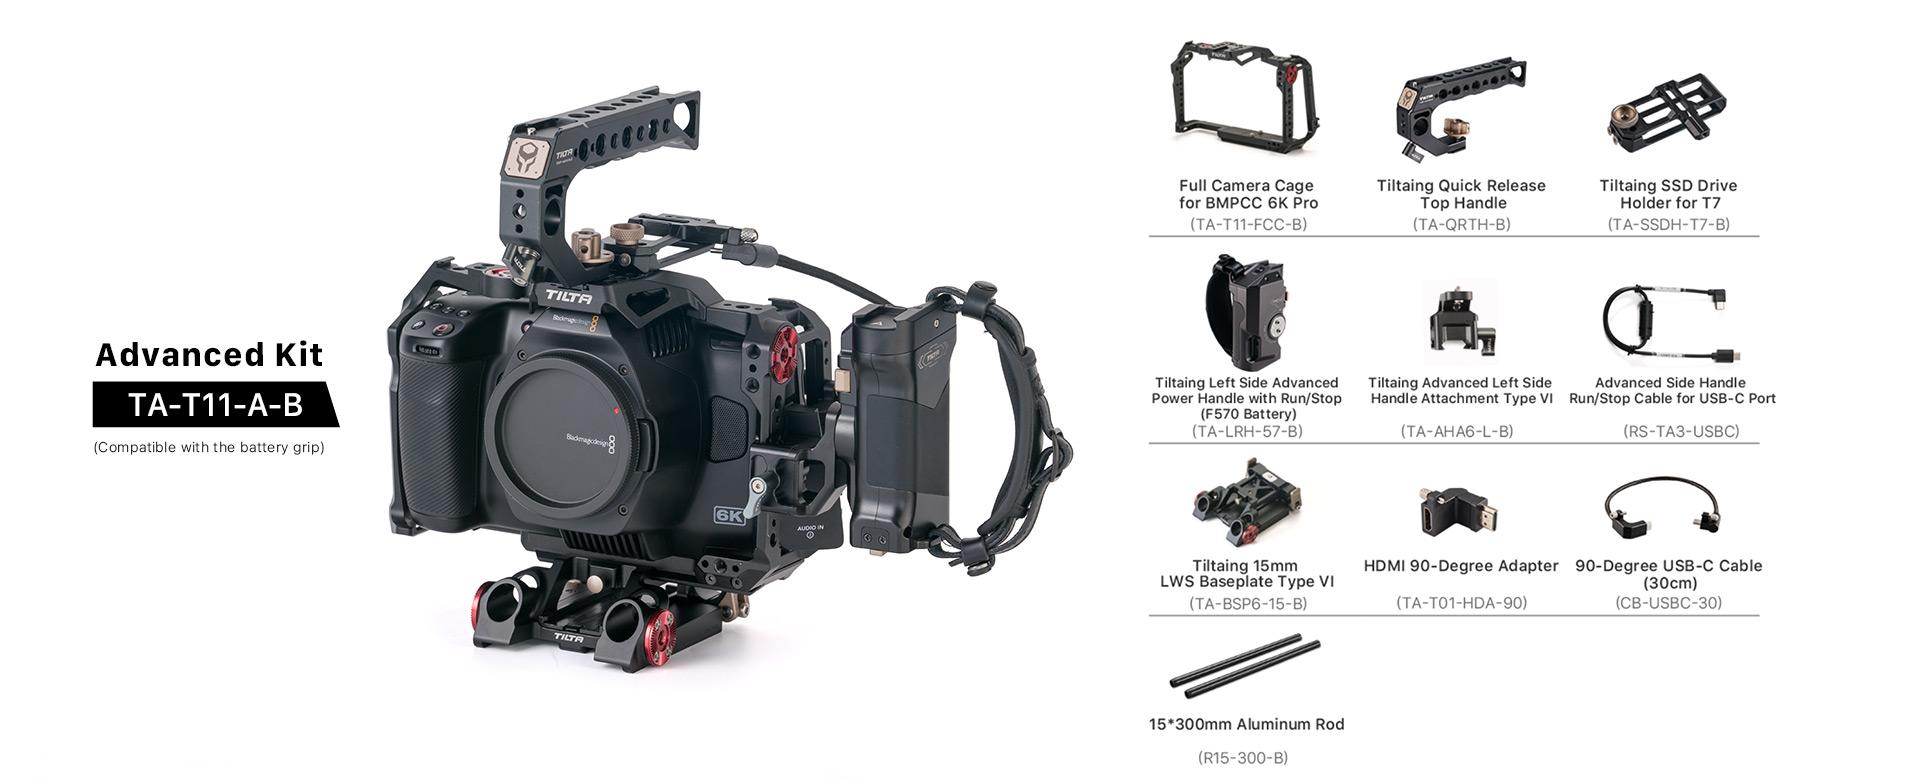 Advanced Kit for BMPCC 6K Pro